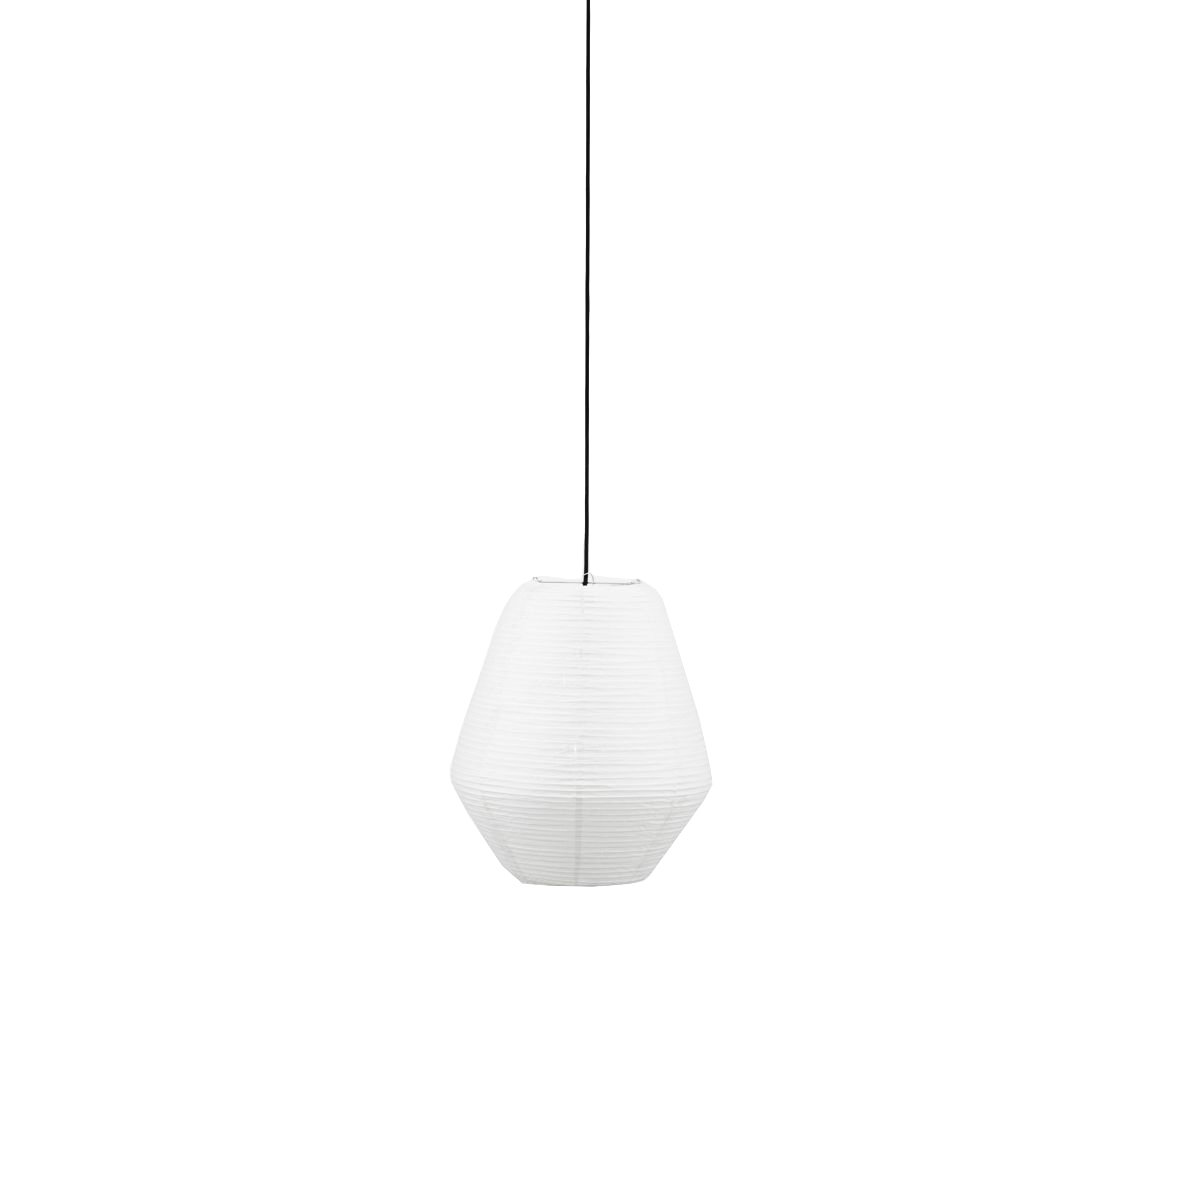 House Doctor - Bidar Lamp Shade Ø 36 cm - White (259370102)